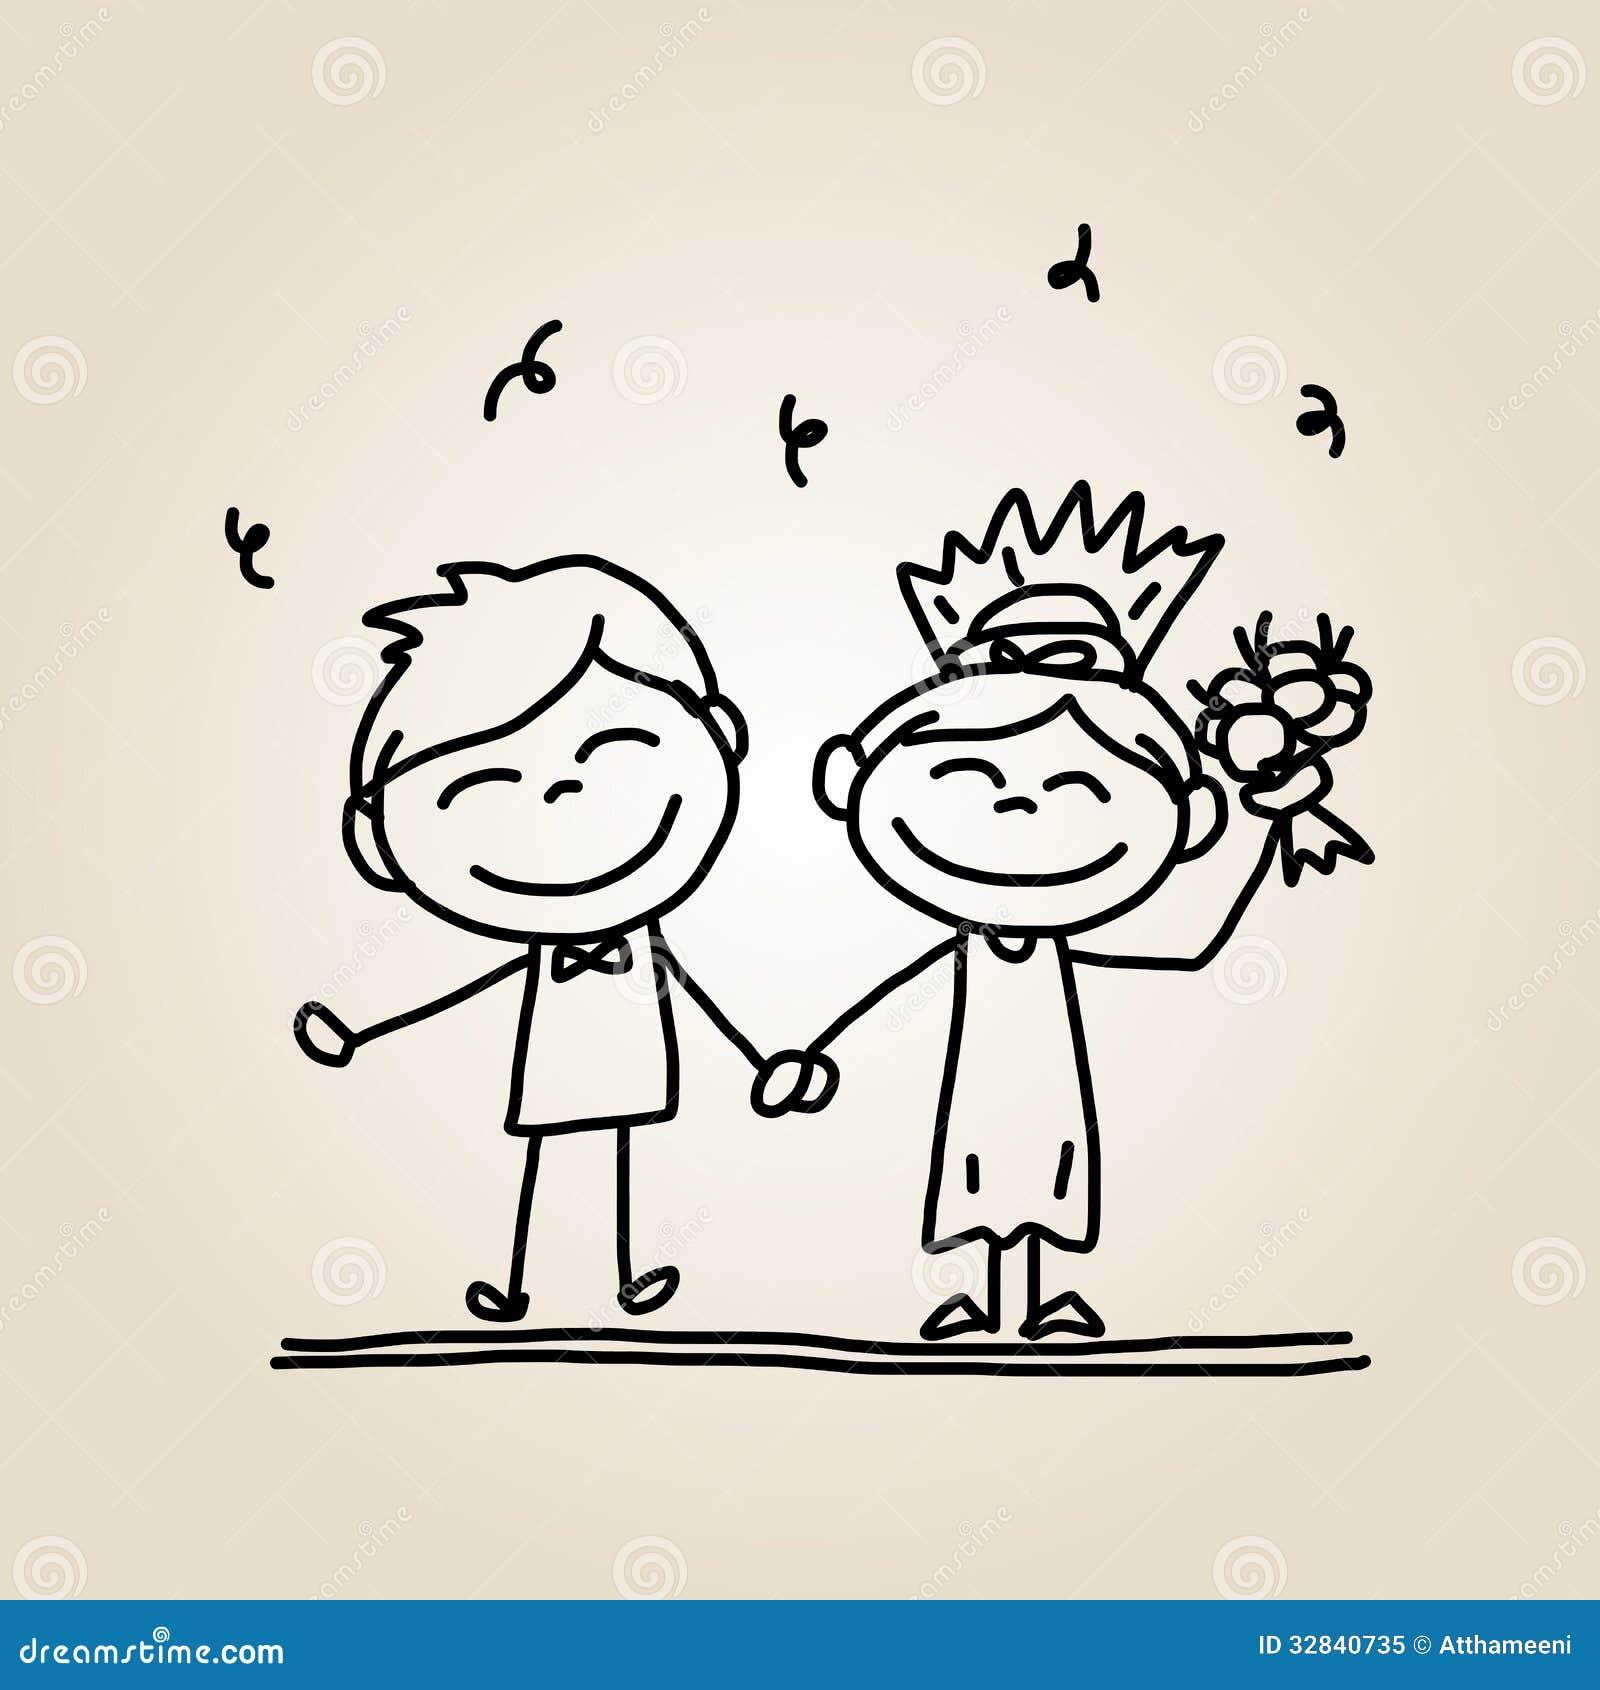 ... Cartoon Happy People Royalty Free Stock Photo - Image: 32840735